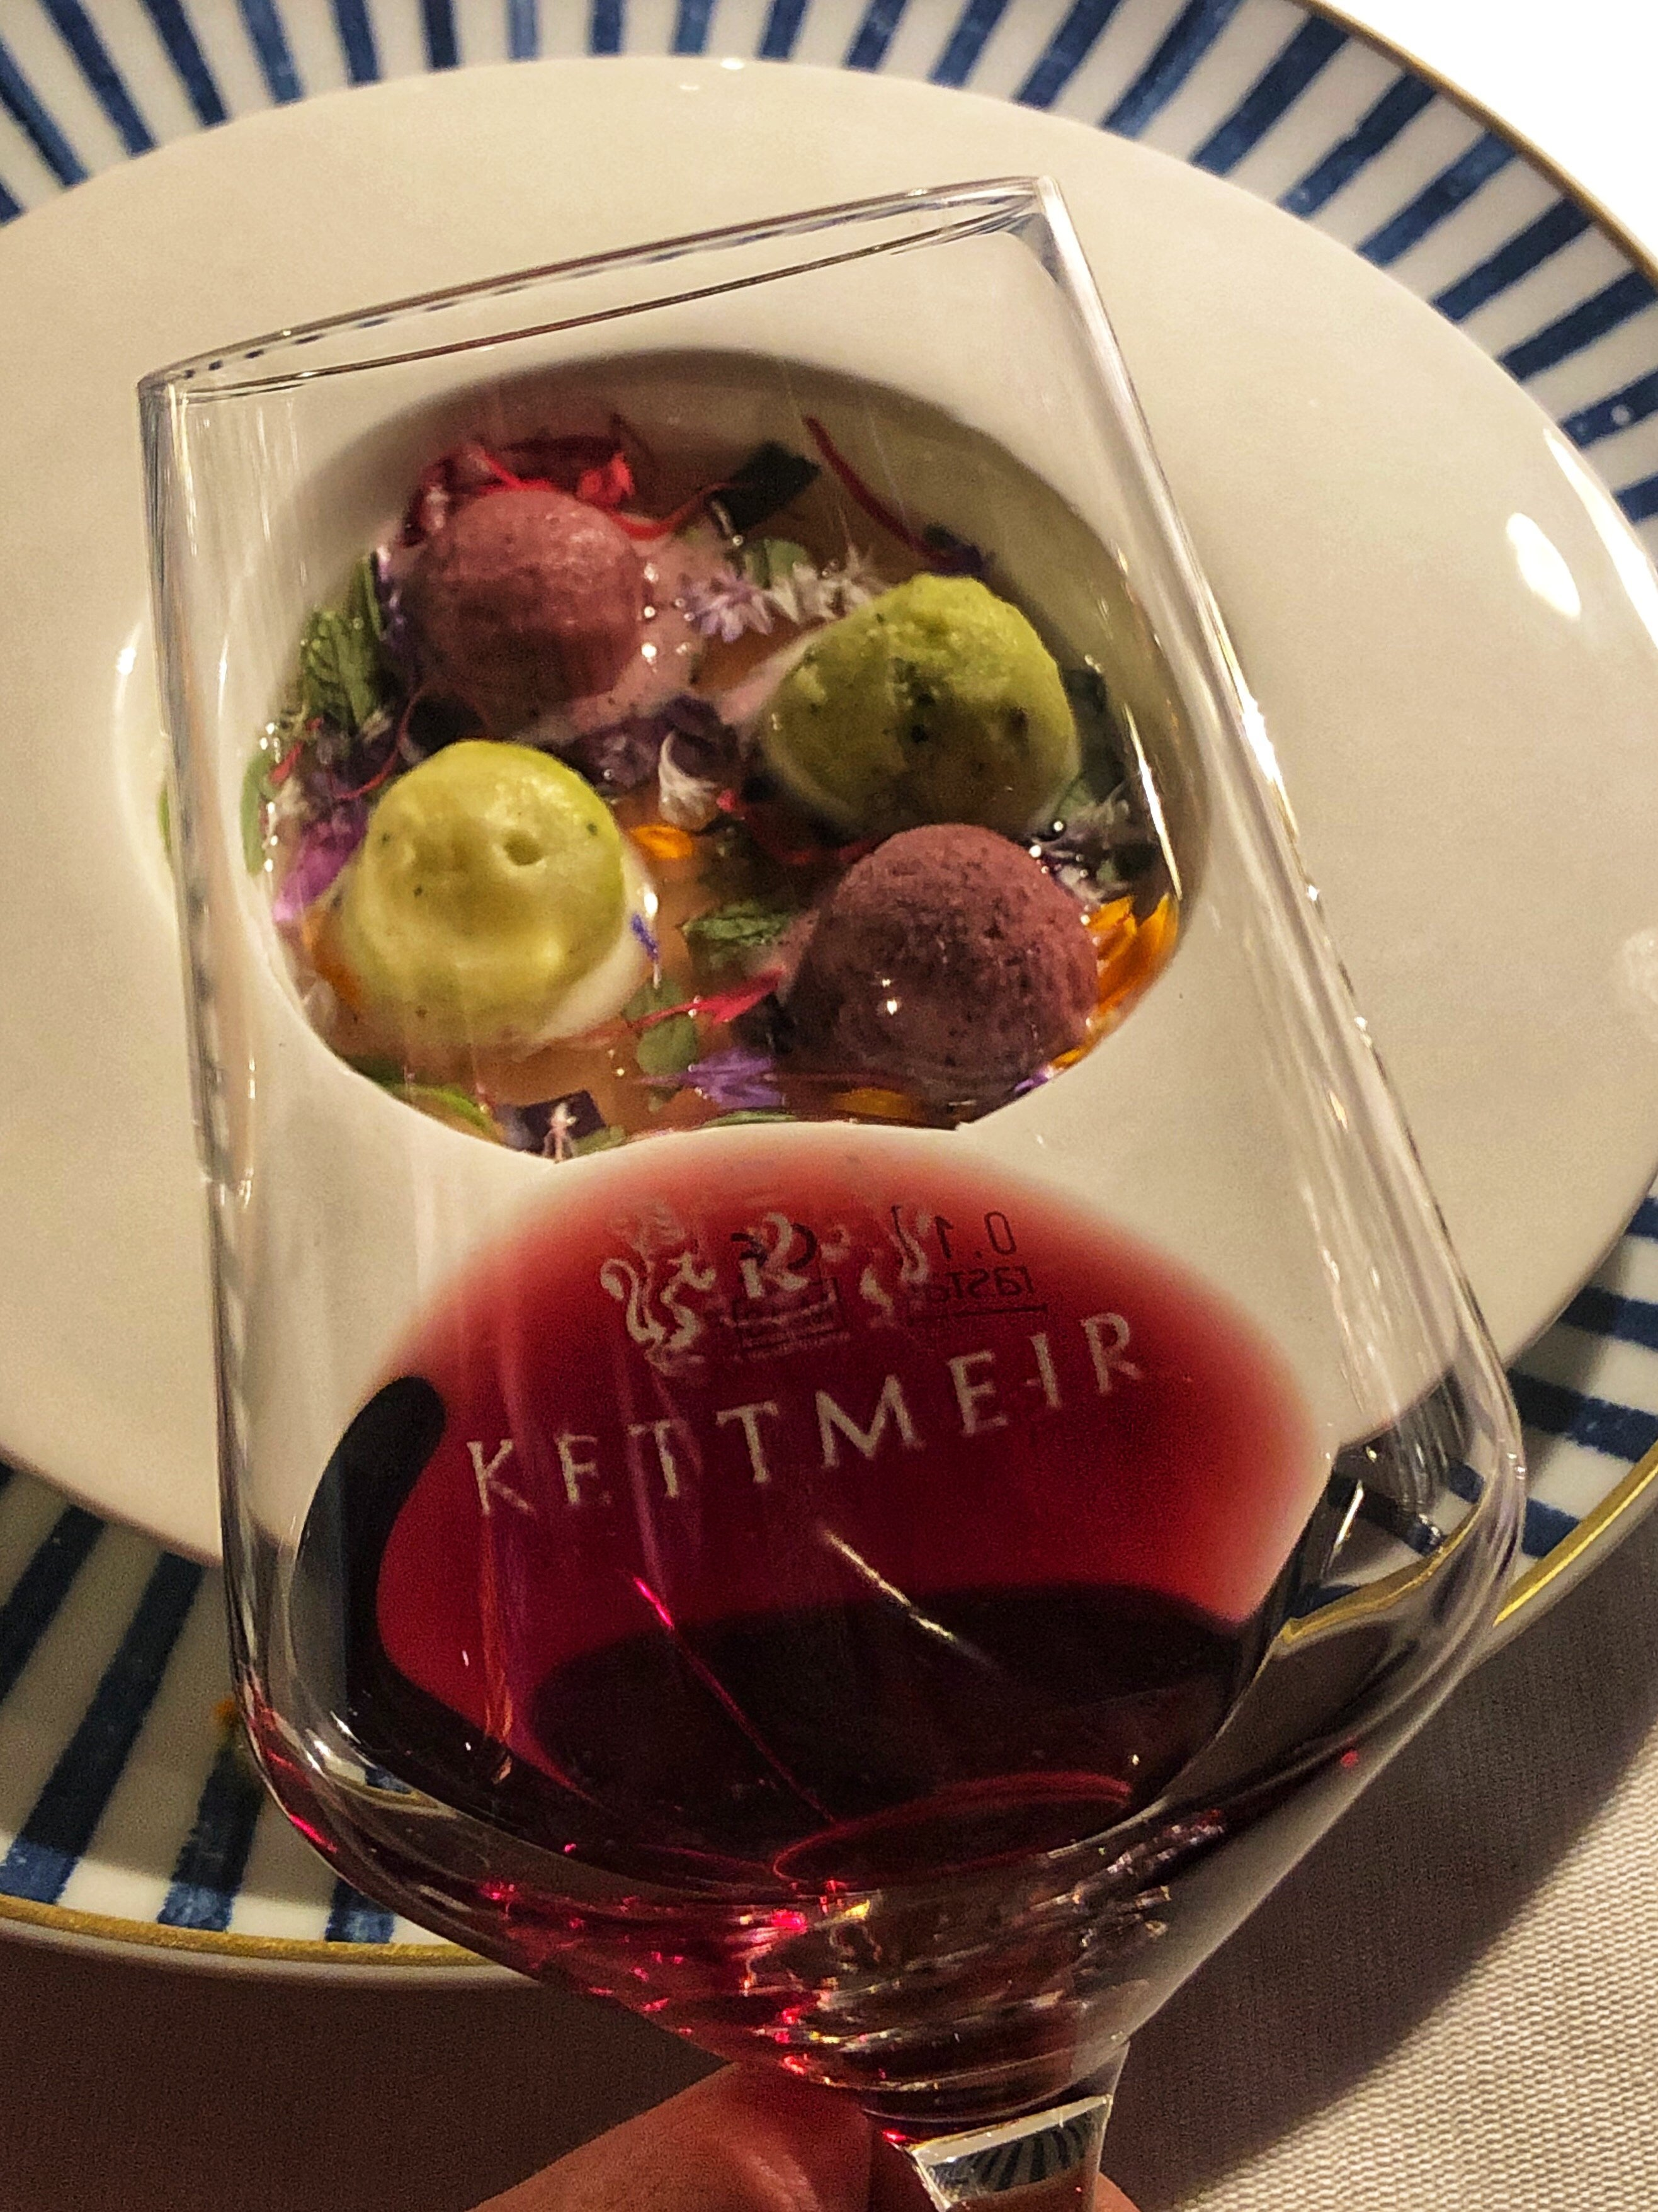 Zuppetta alle erbe aromatiche di Anna Matscher